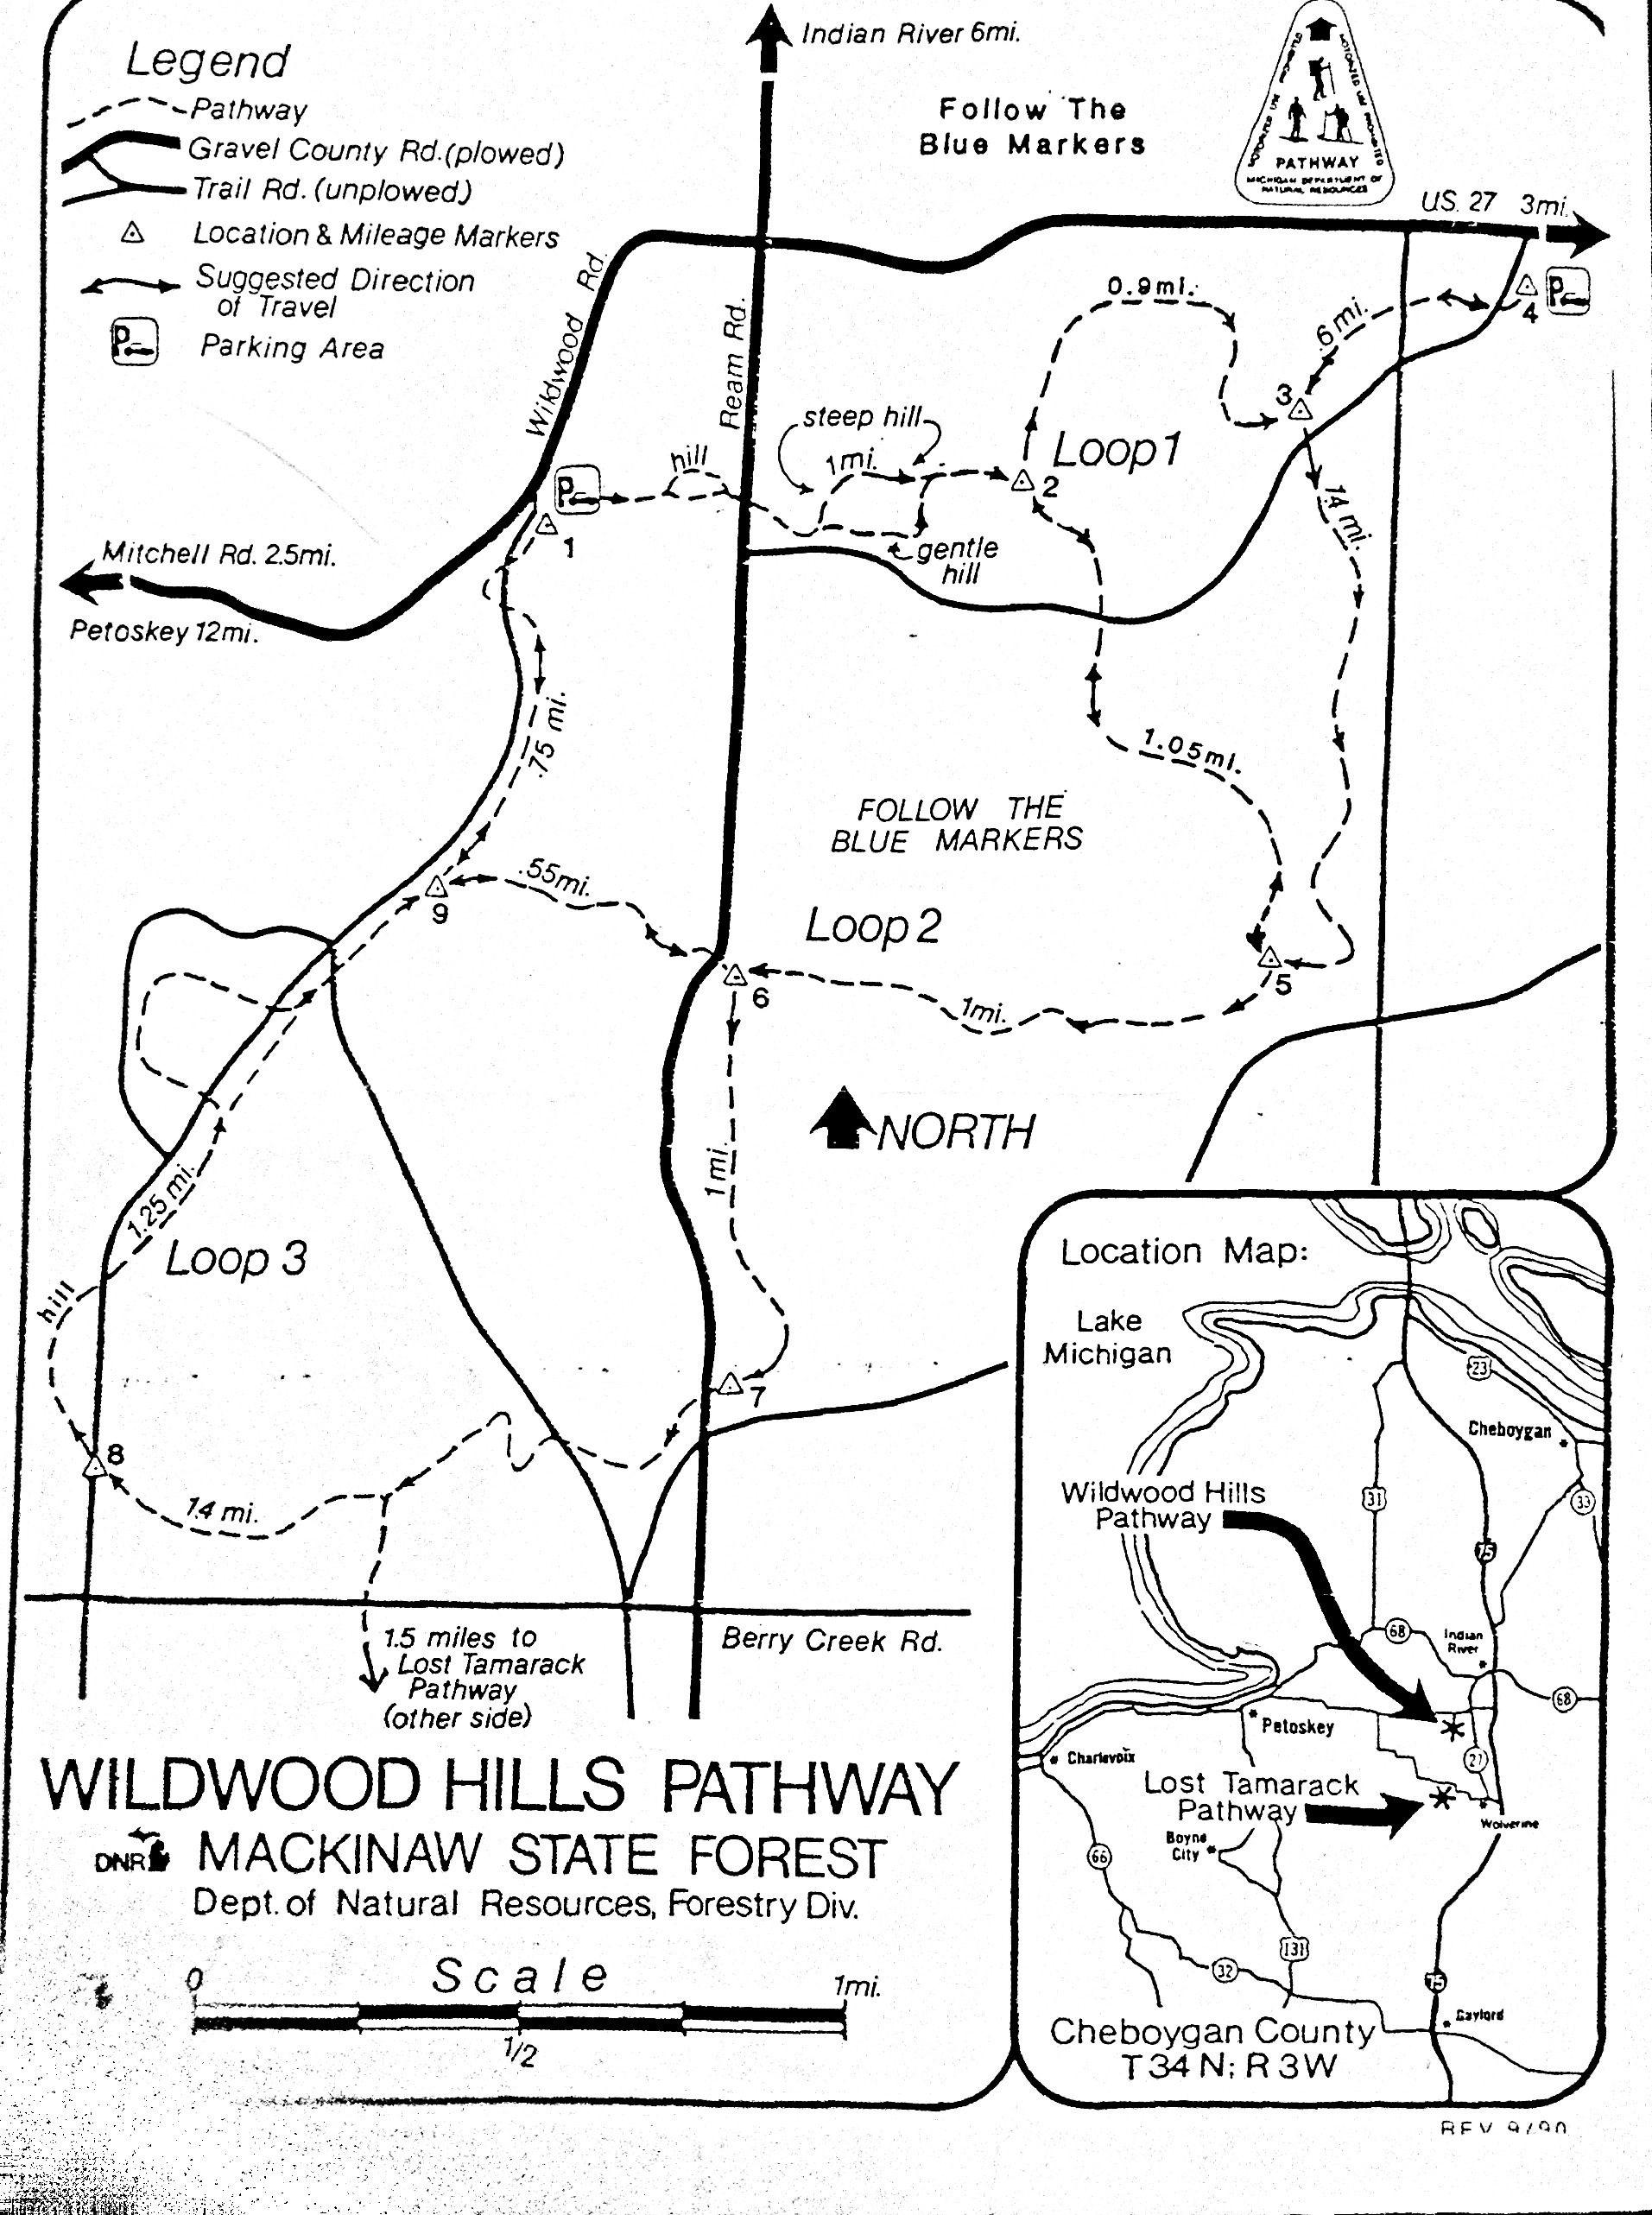 wildwood hills pathway n river mi hiking cross a country wildwood hills pathway n river mi hiking cross a country ski trails snowshoe hiking trails northern mi up ski crosses and country